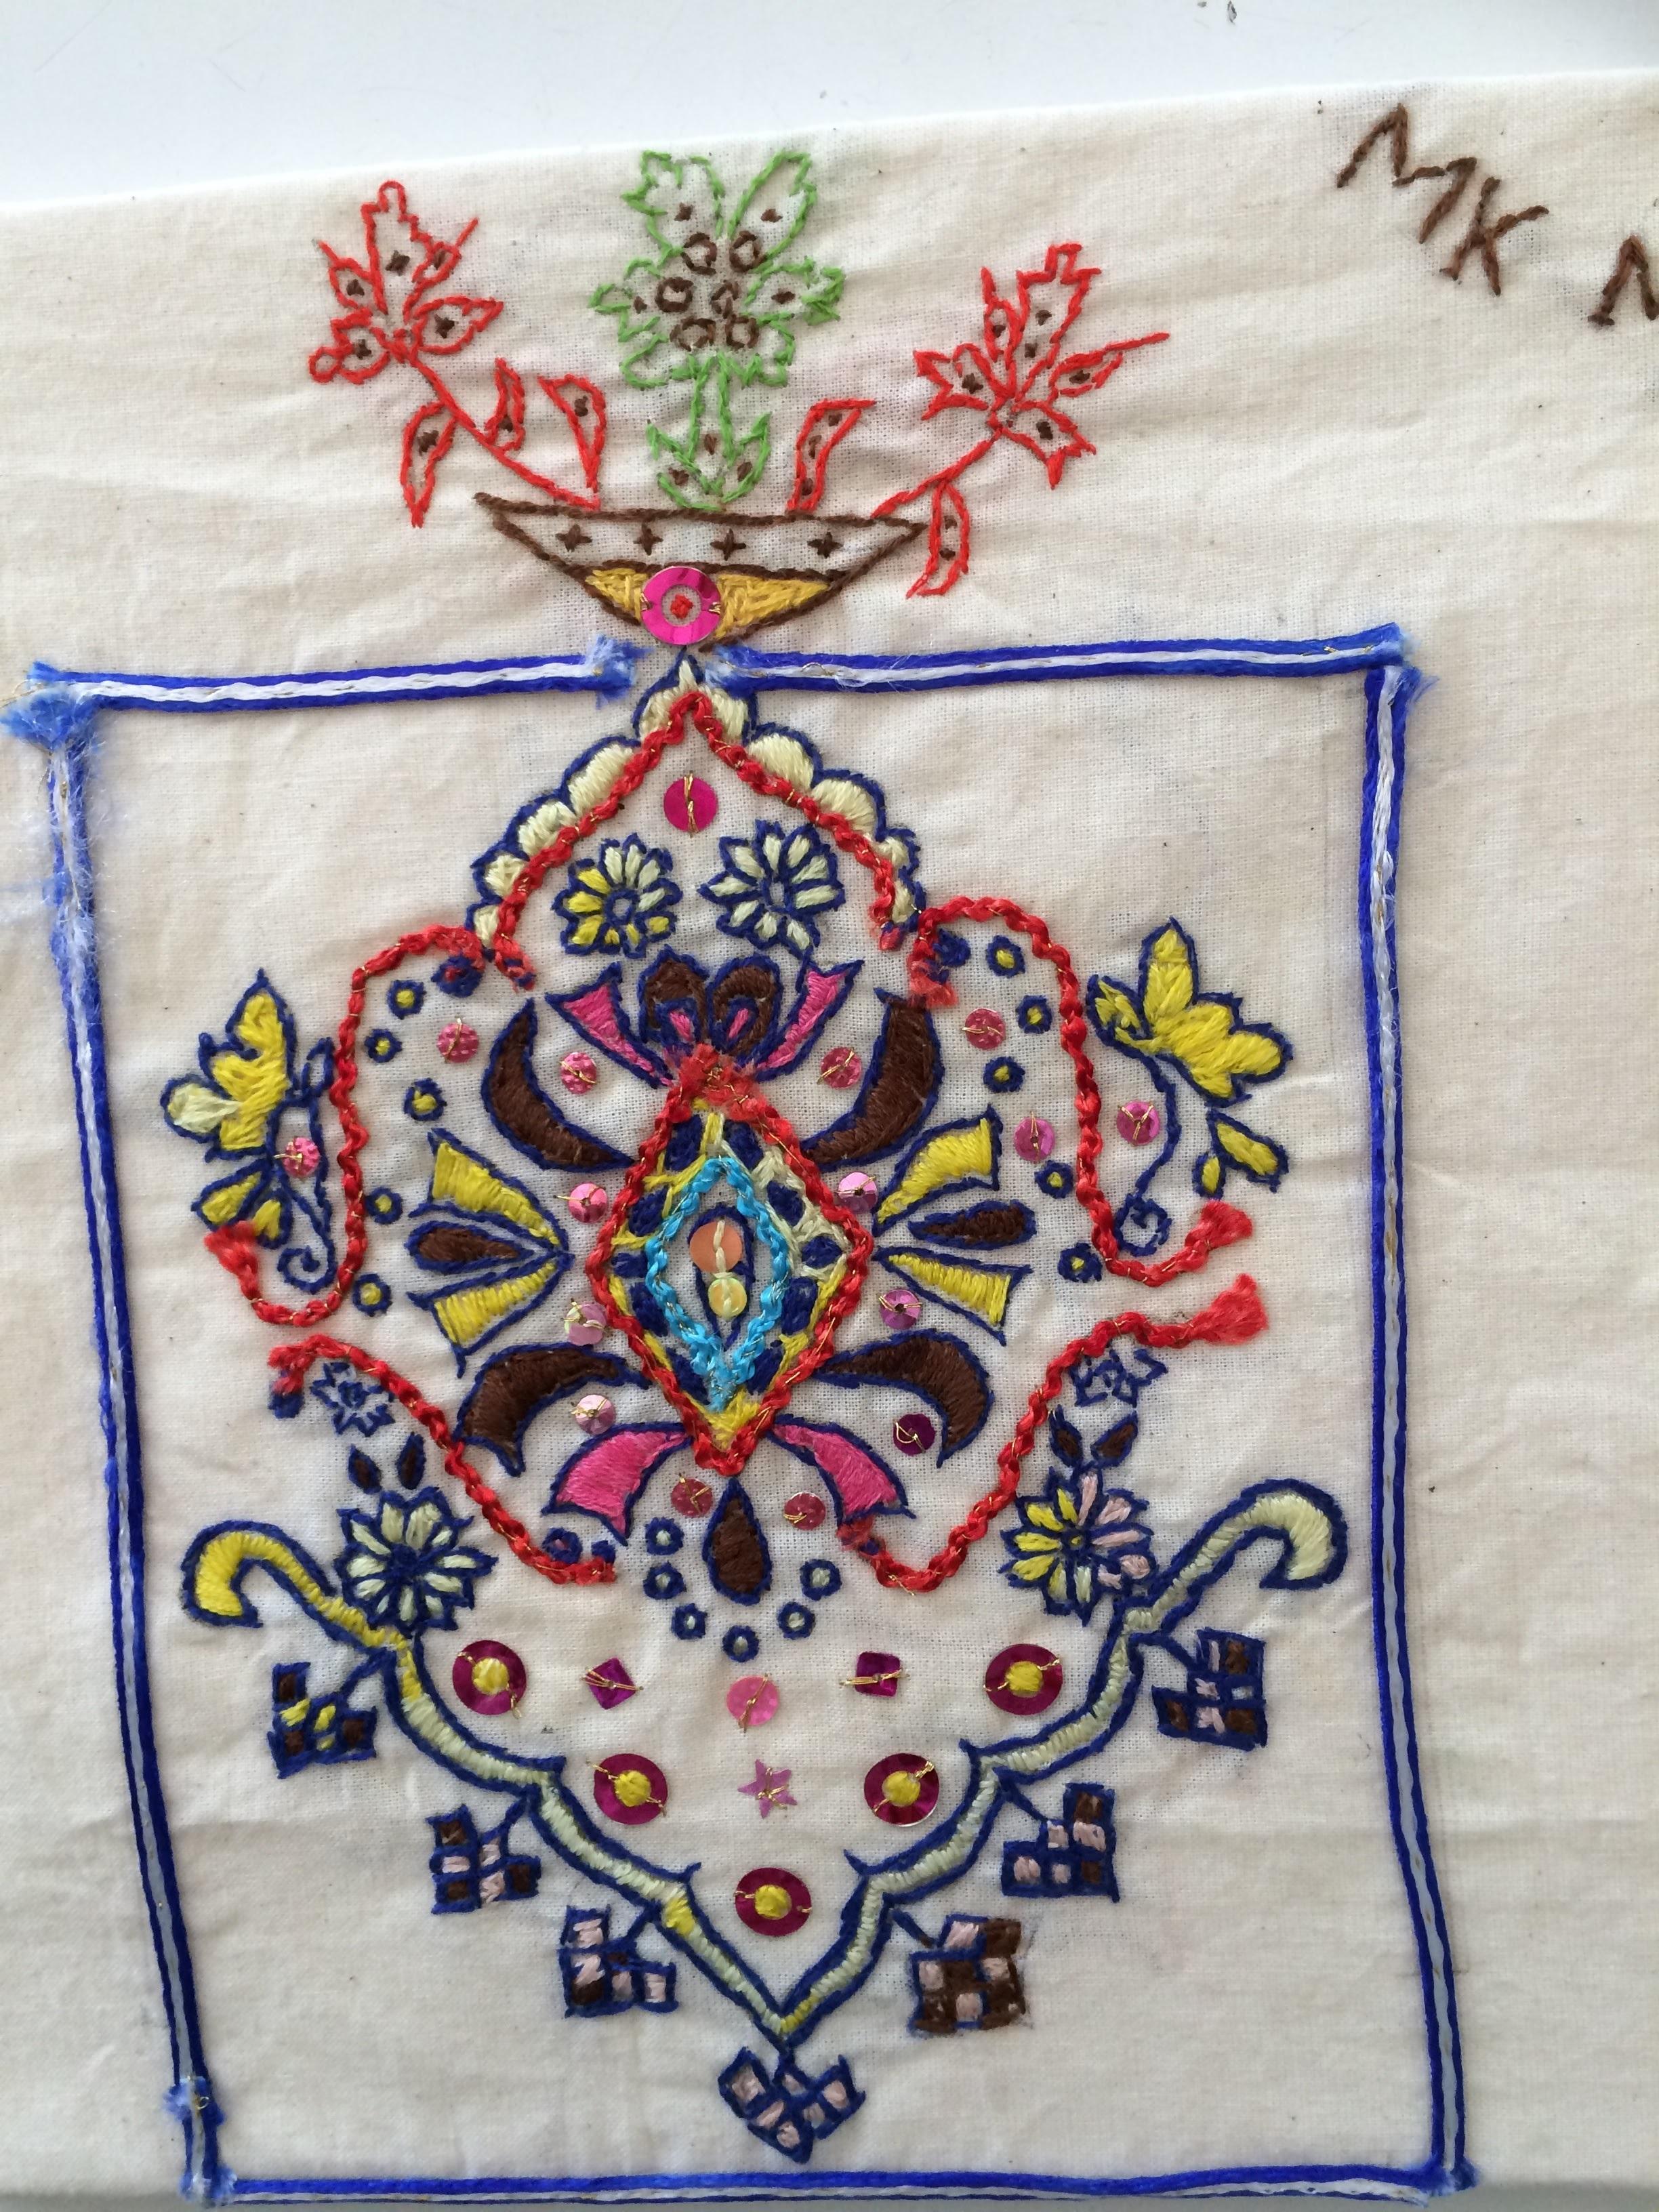 Square embroidery (Manik Miah)